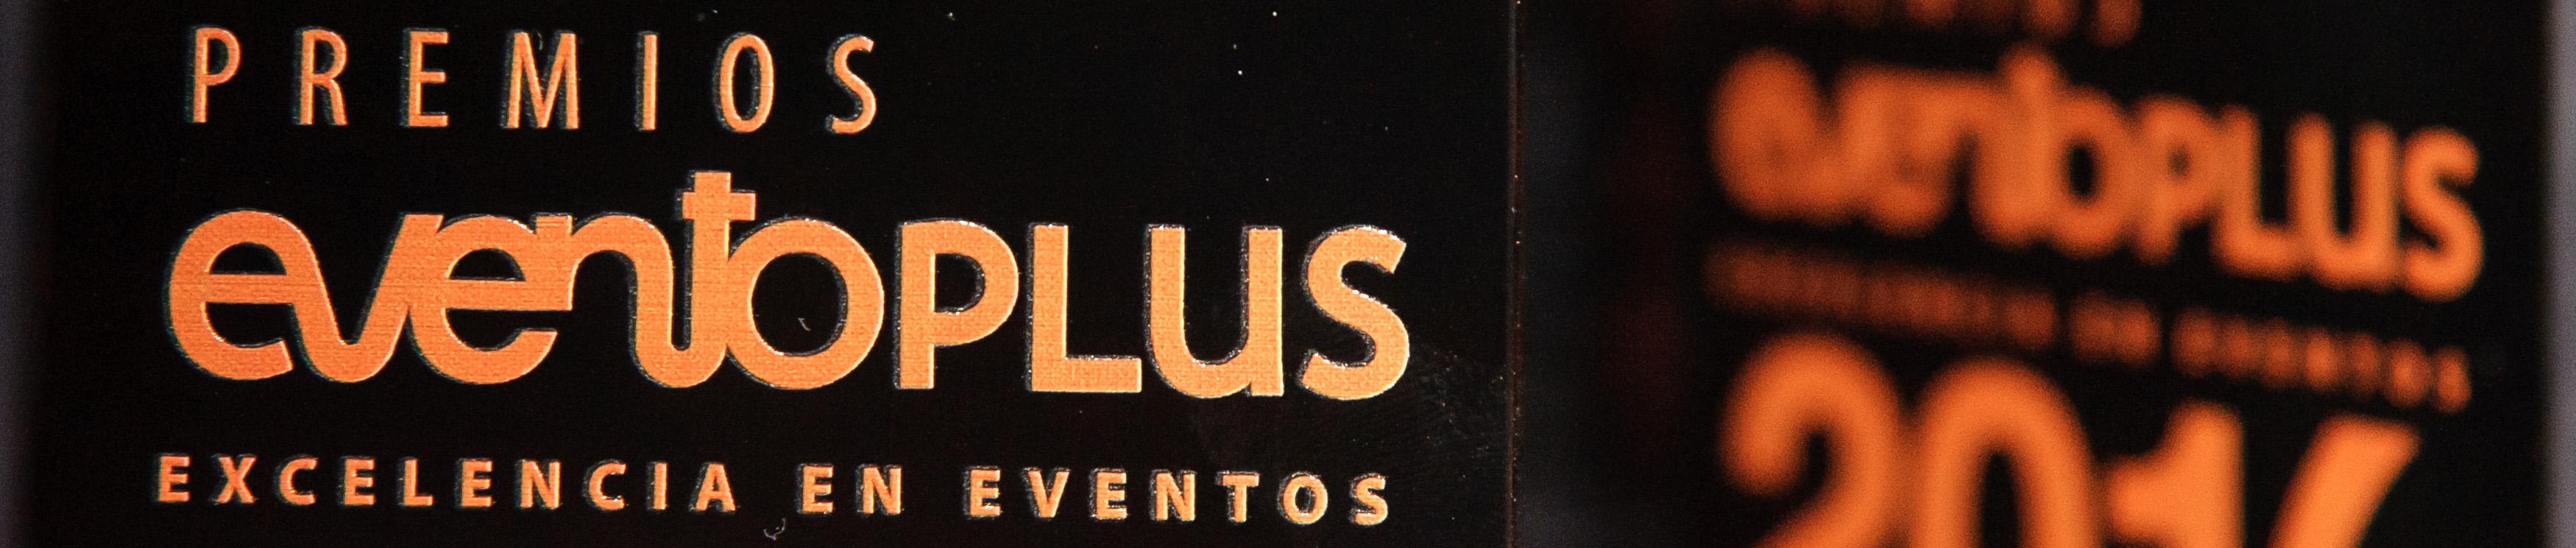 eventoplus-premios-6julio2016-105-recortada